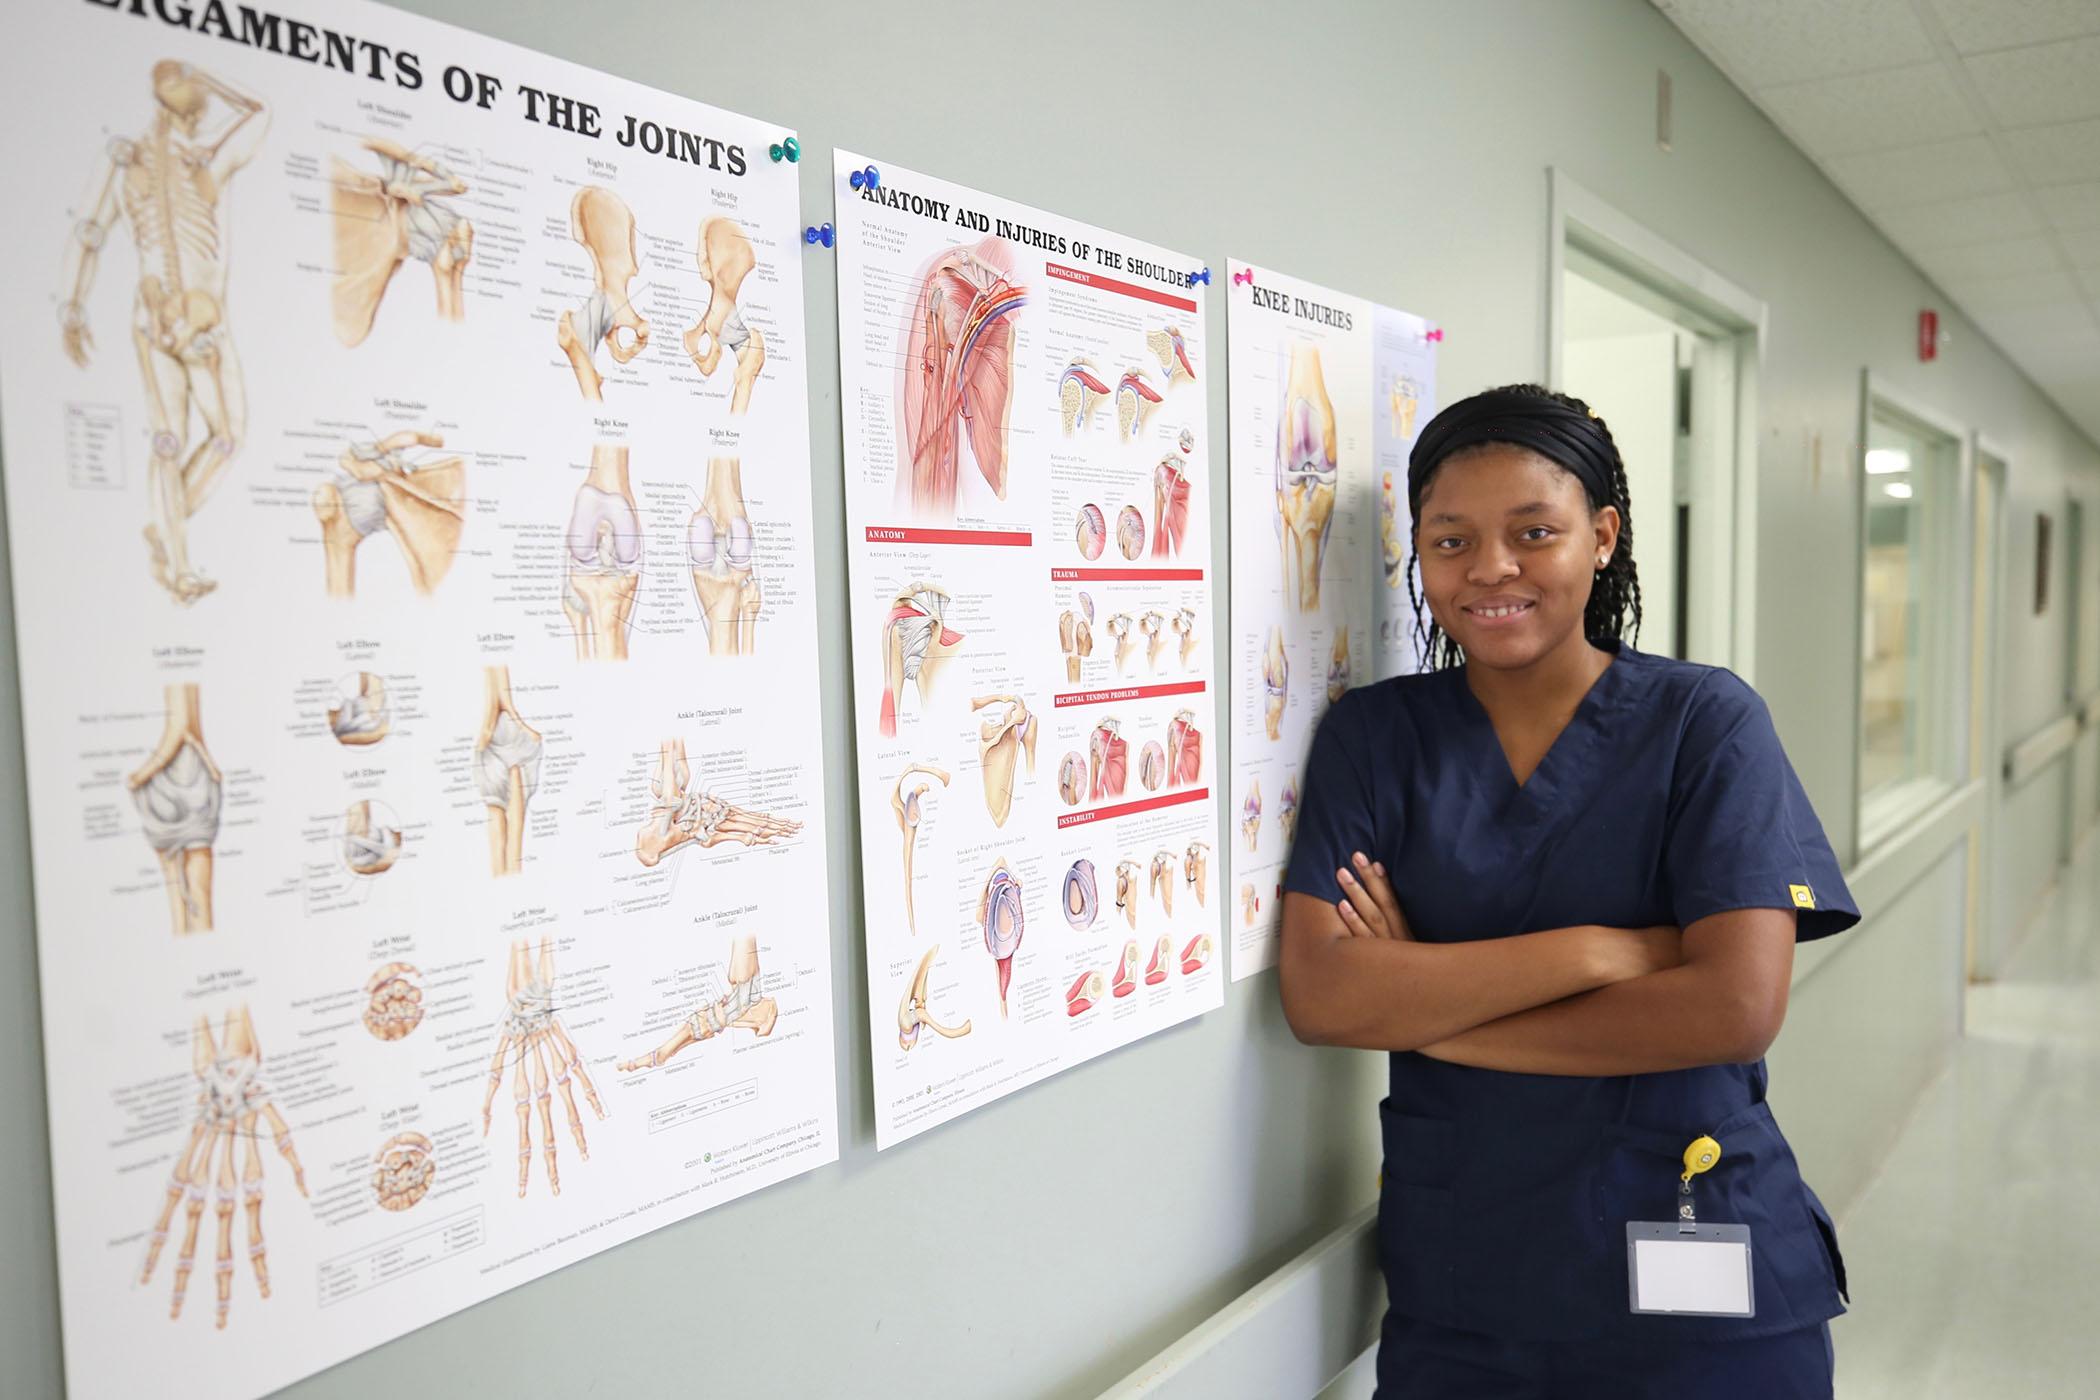 Jaureka attends clinicals at a local hospital.